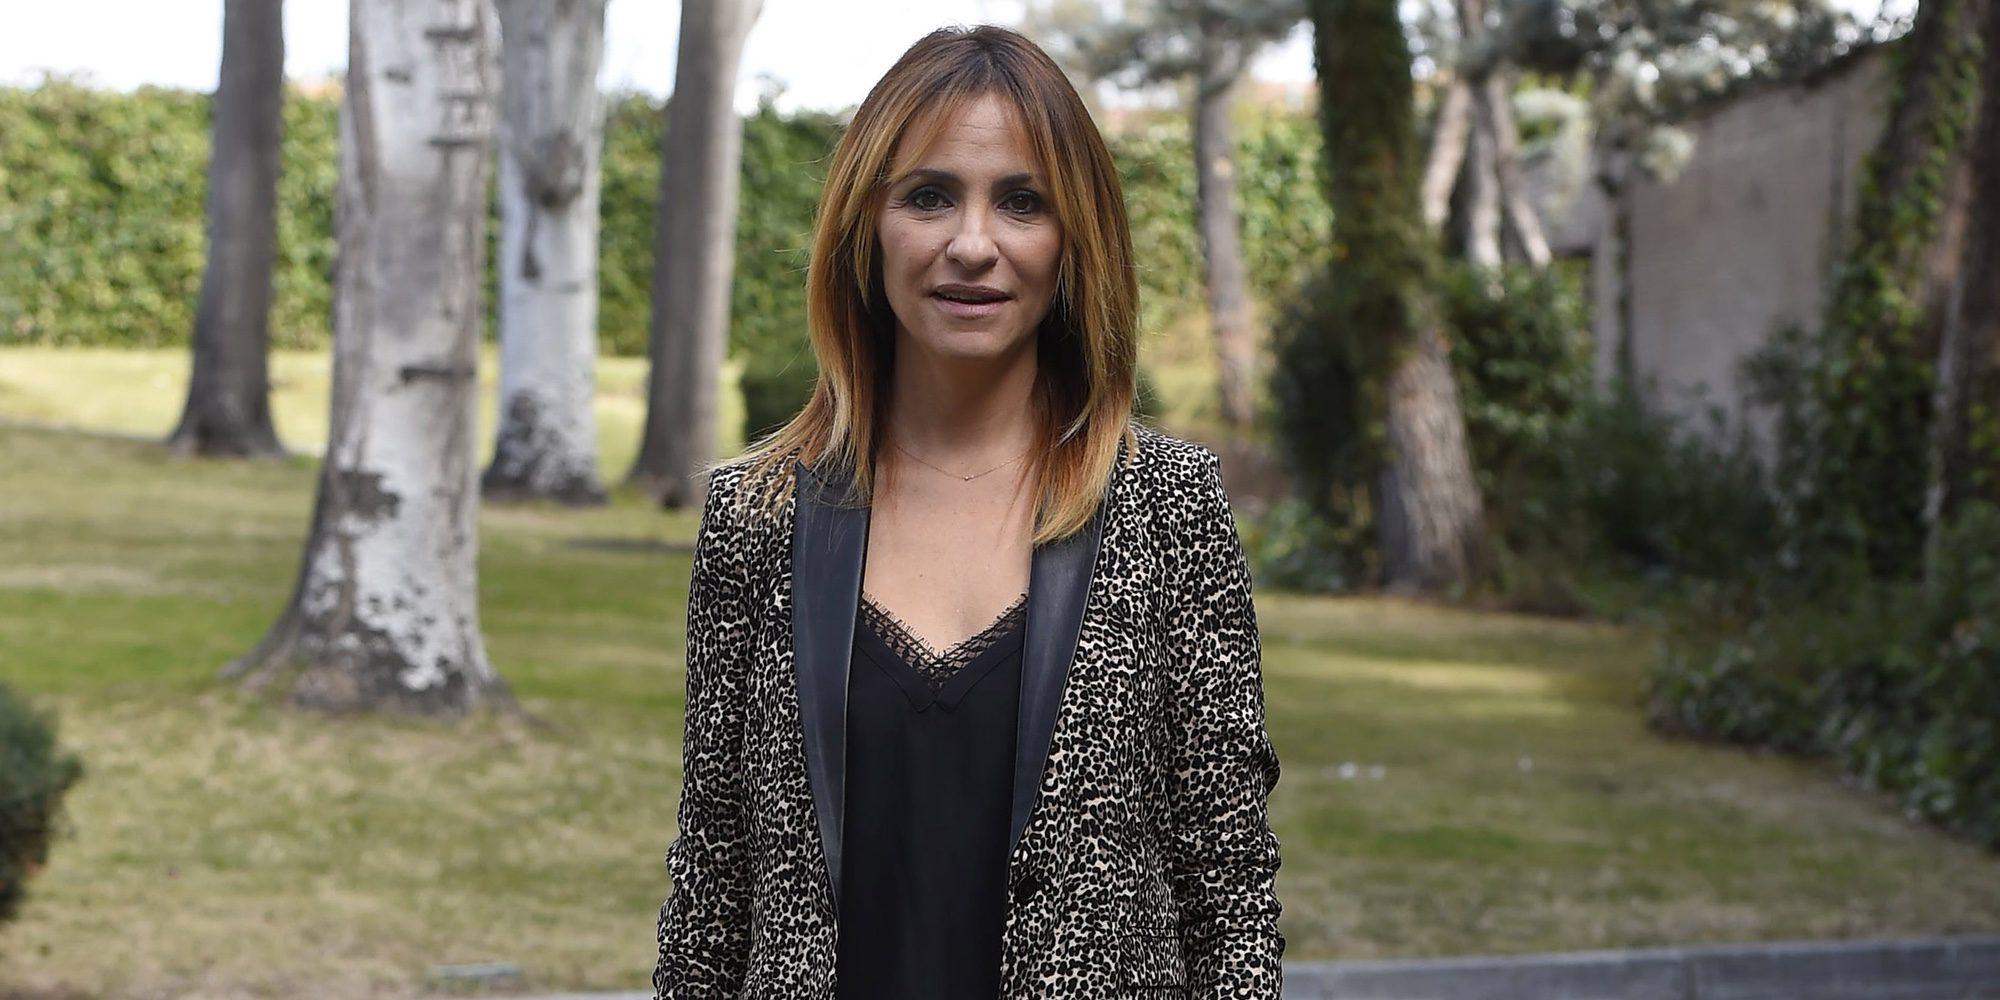 Melani Olivares confirma el sexo del bebé que espera junto a Gorka González y revela su nombre